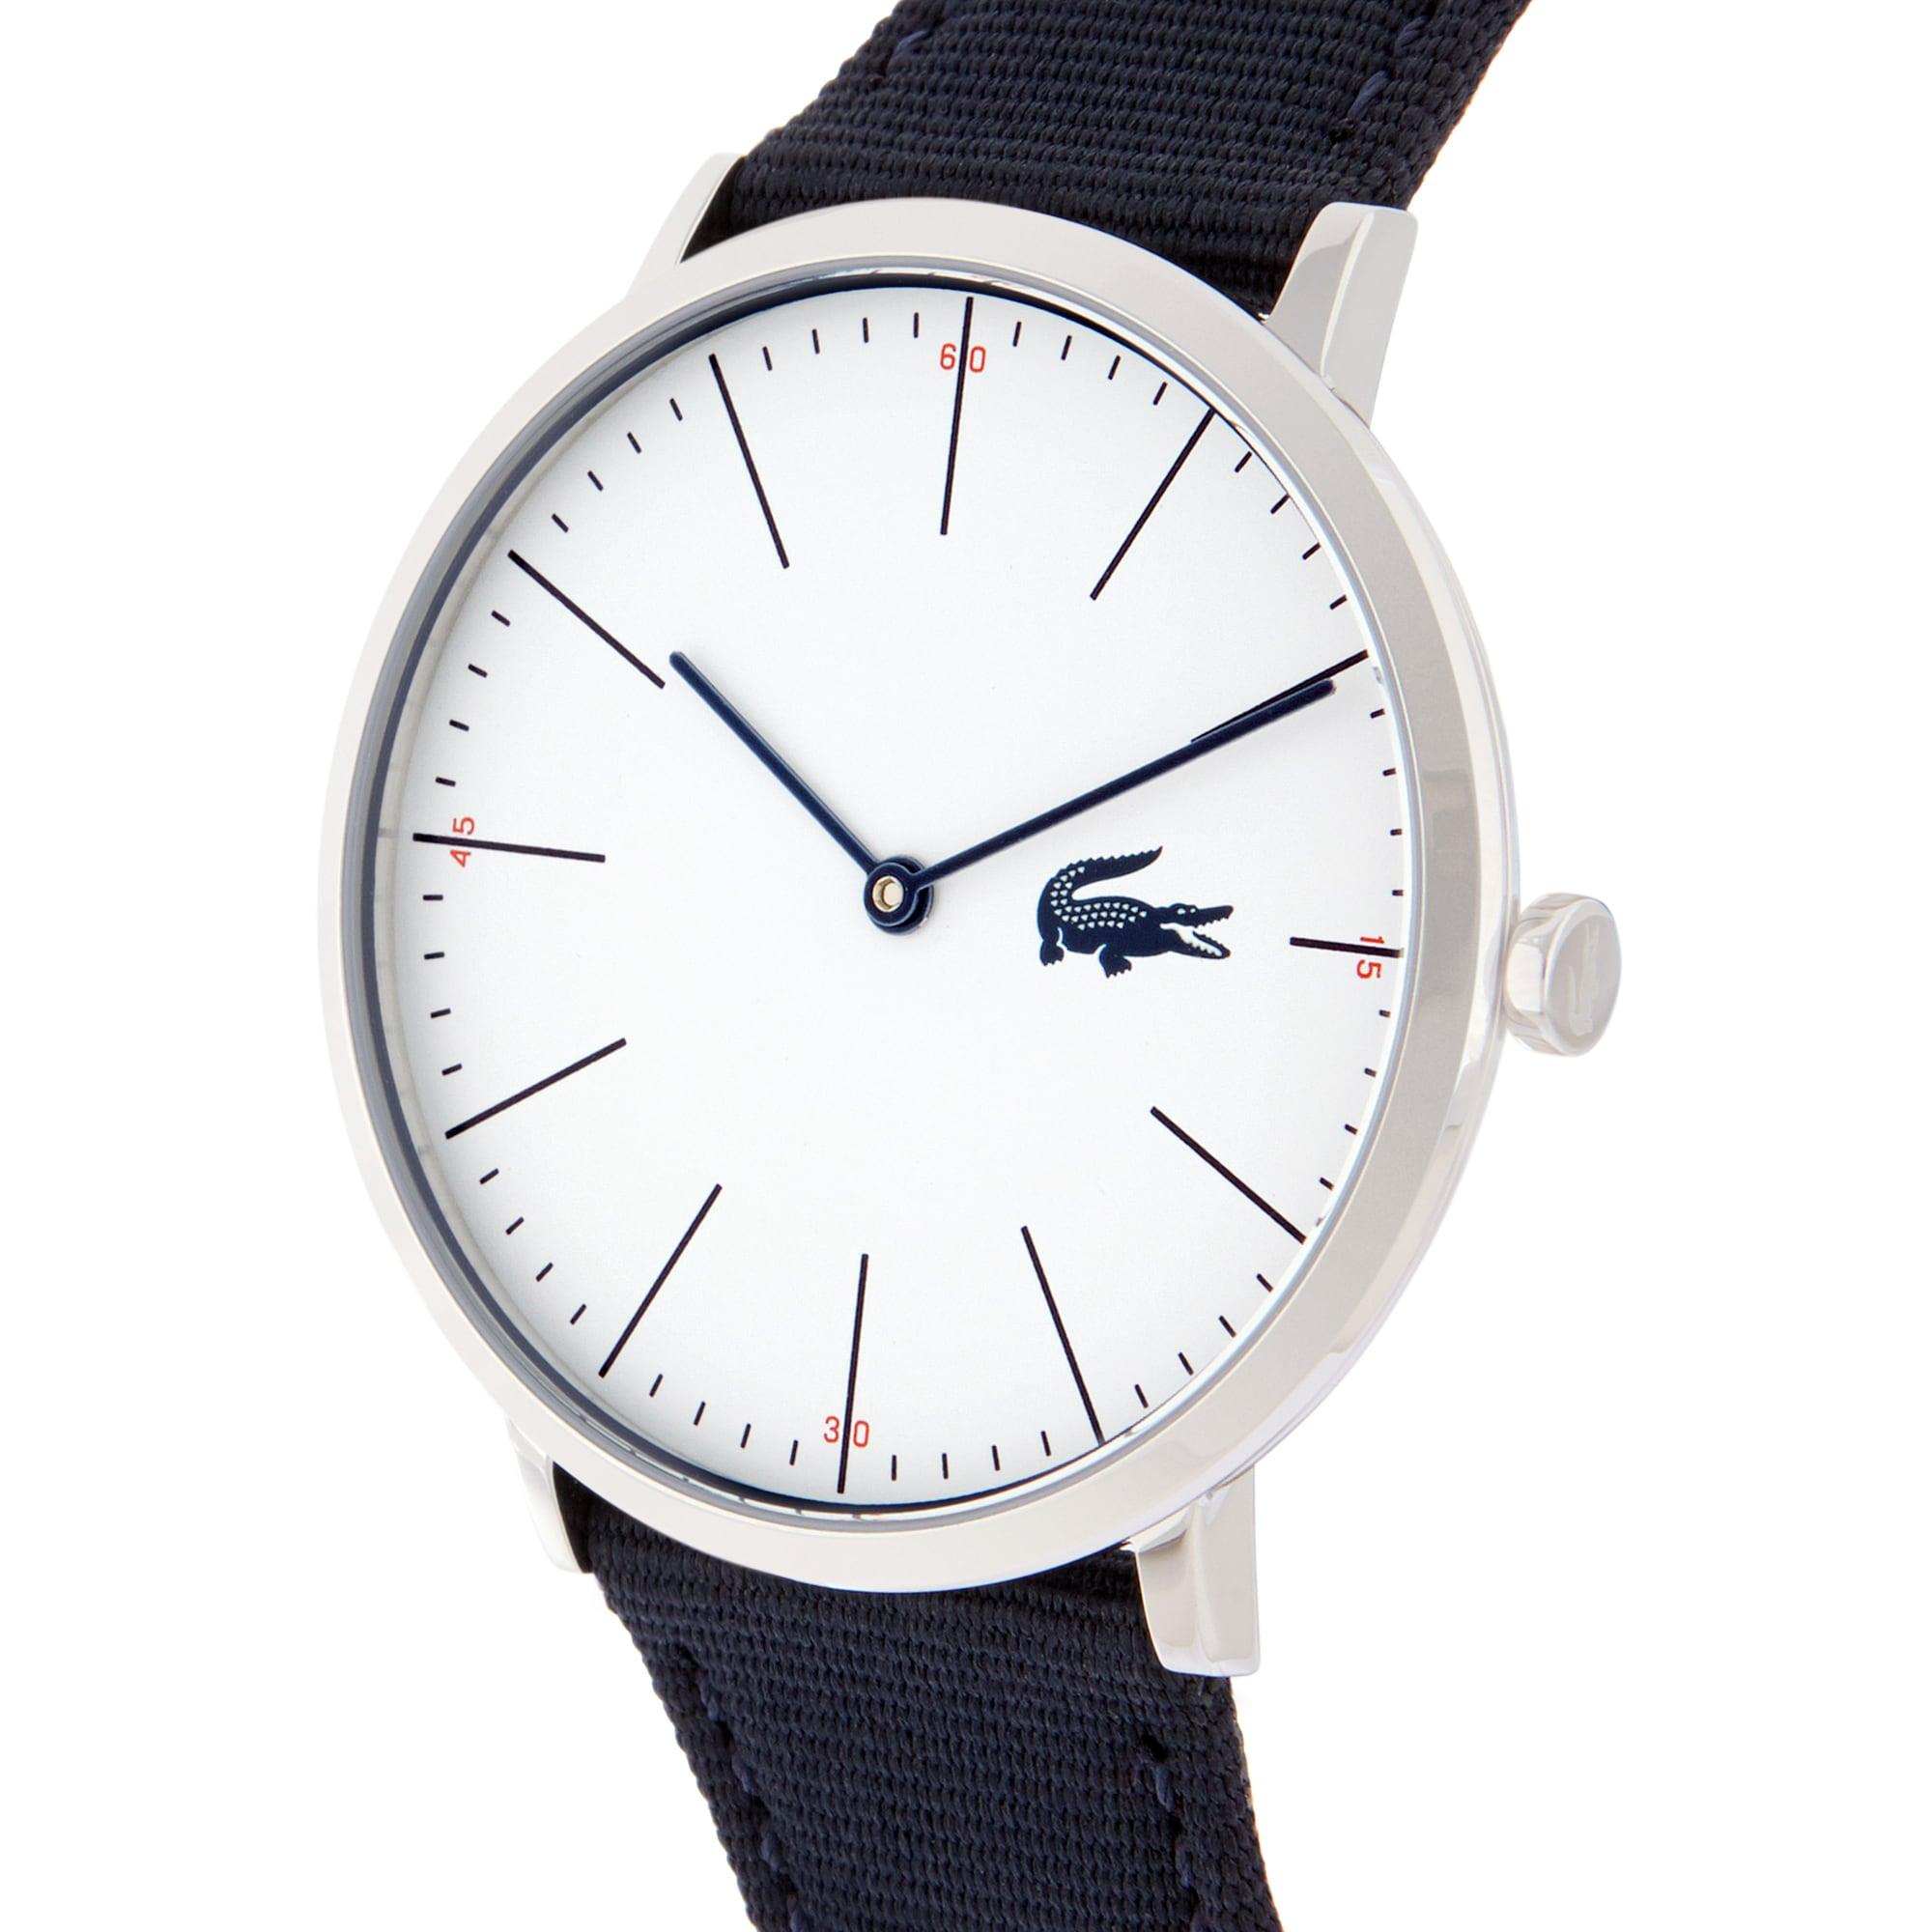 Reloj de Hombre Moon Ultrafino con Correa Textil Azul